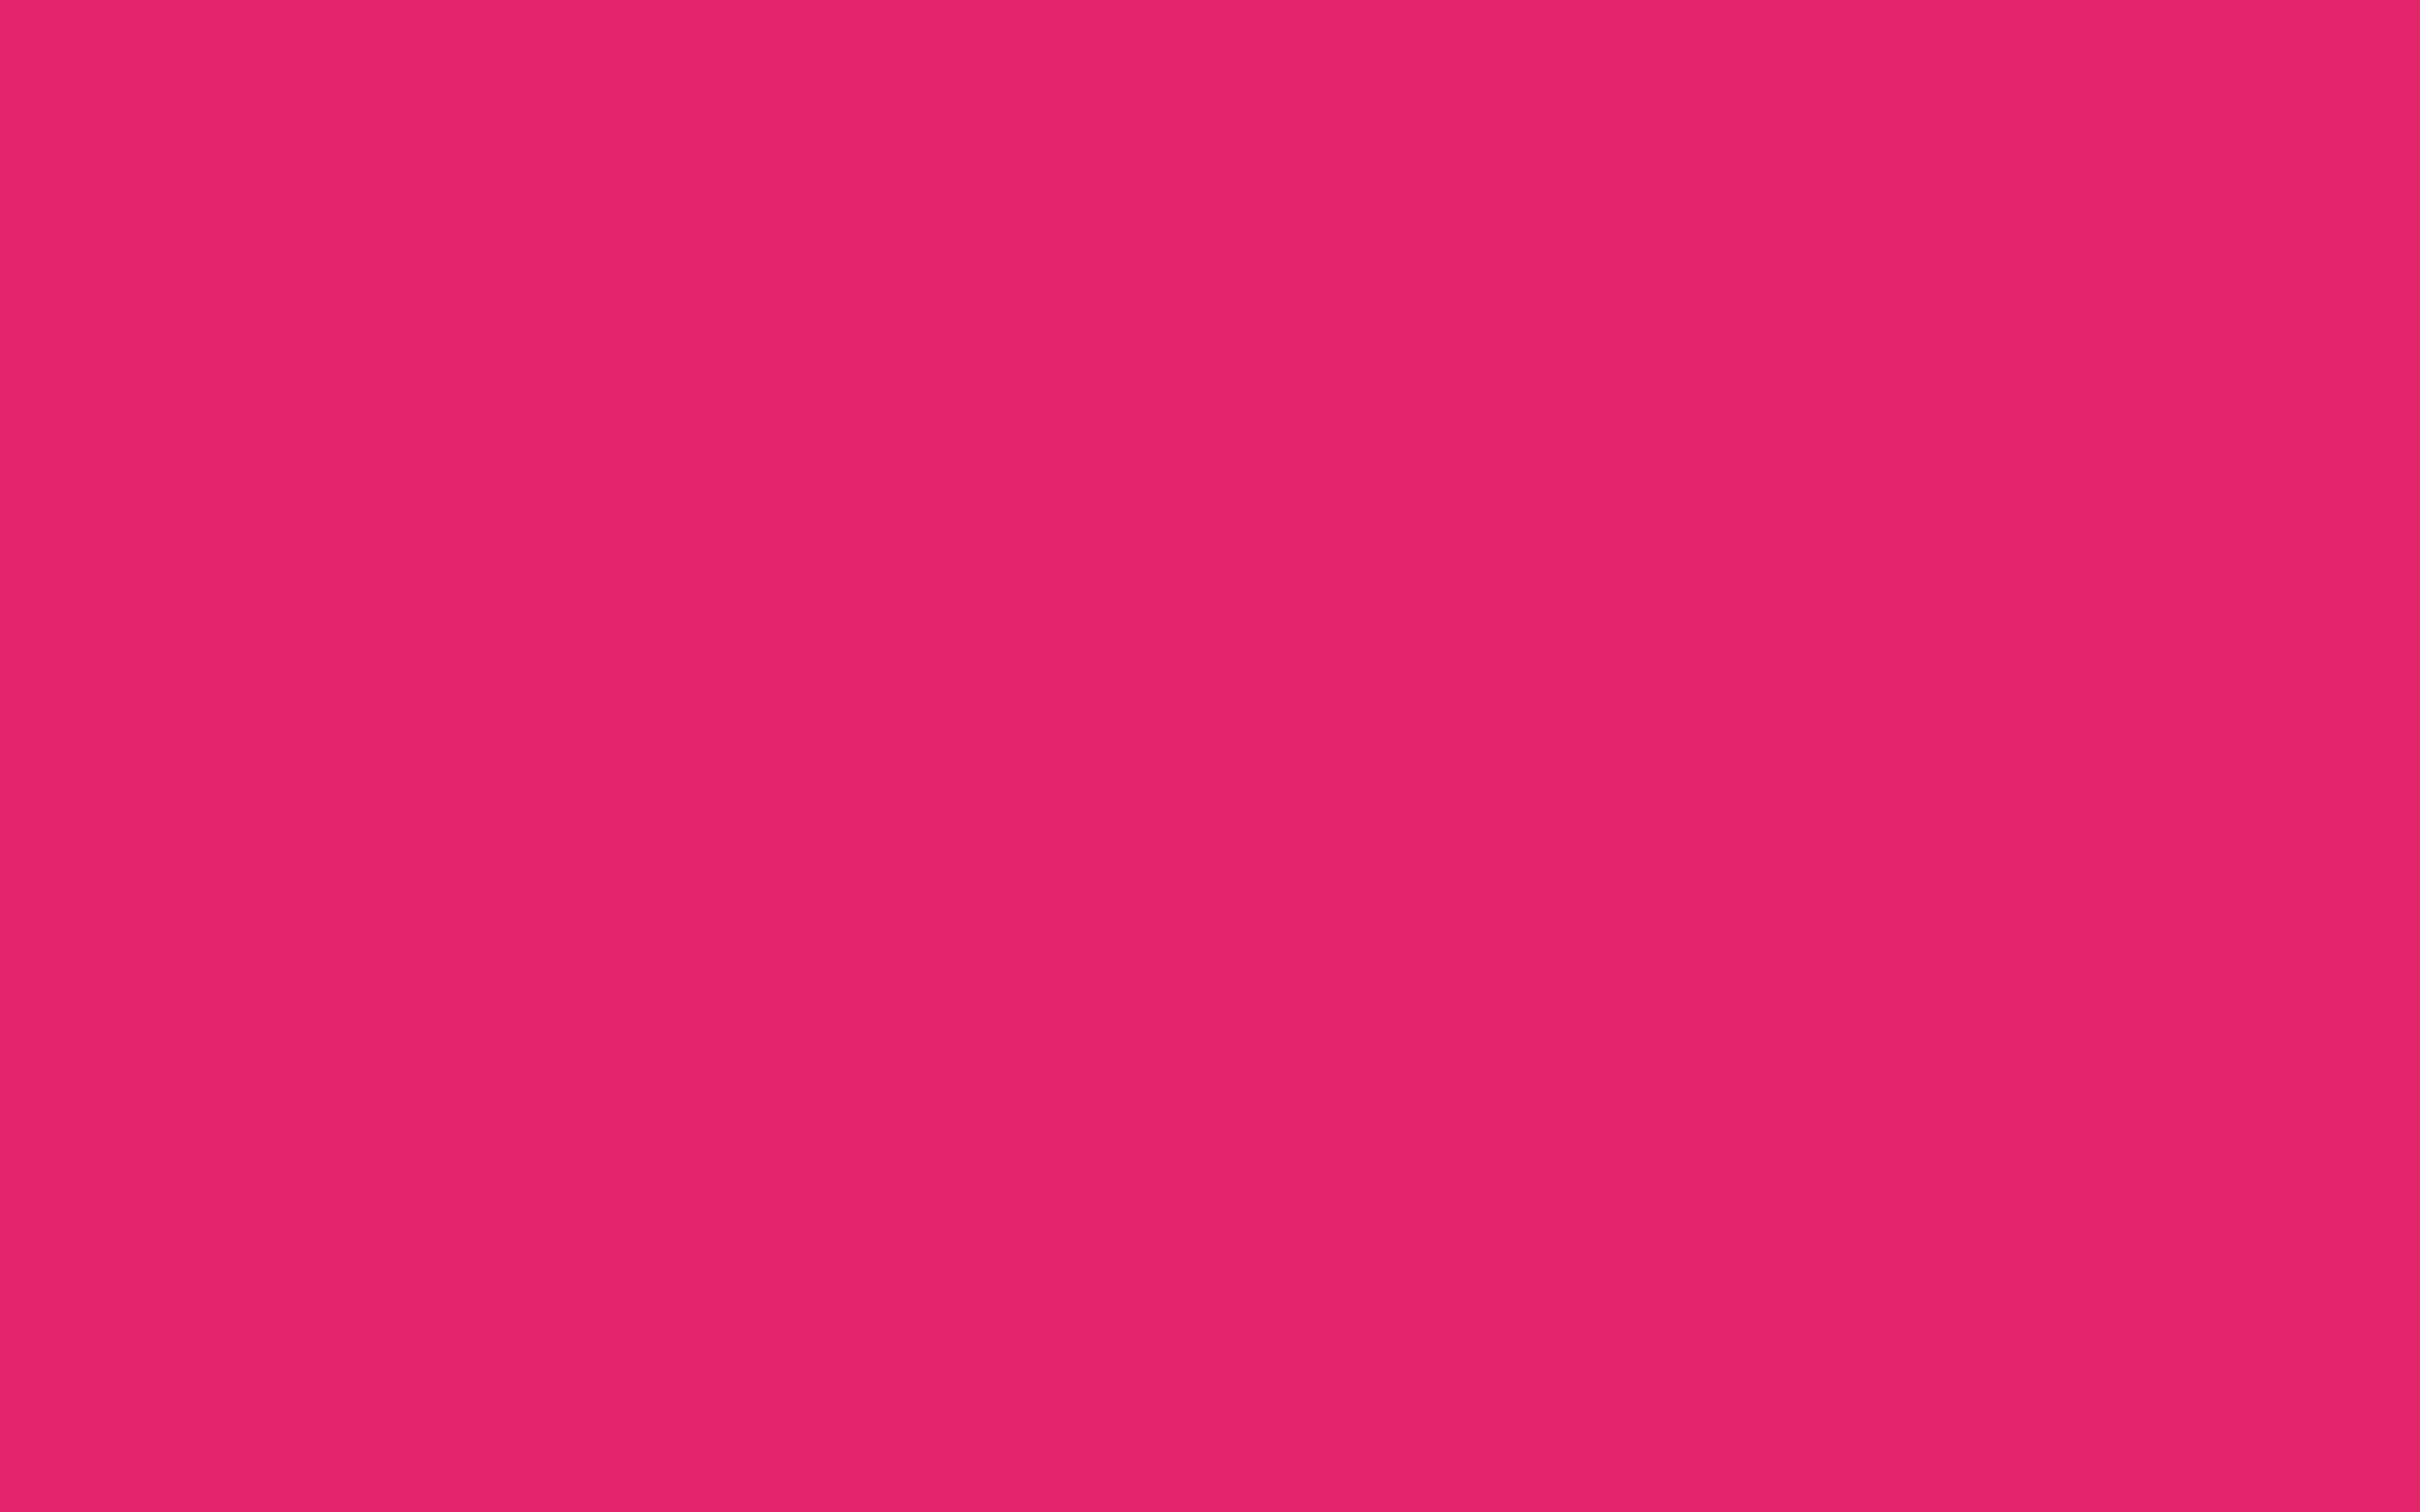 2560x1600 Razzmatazz Solid Color Background